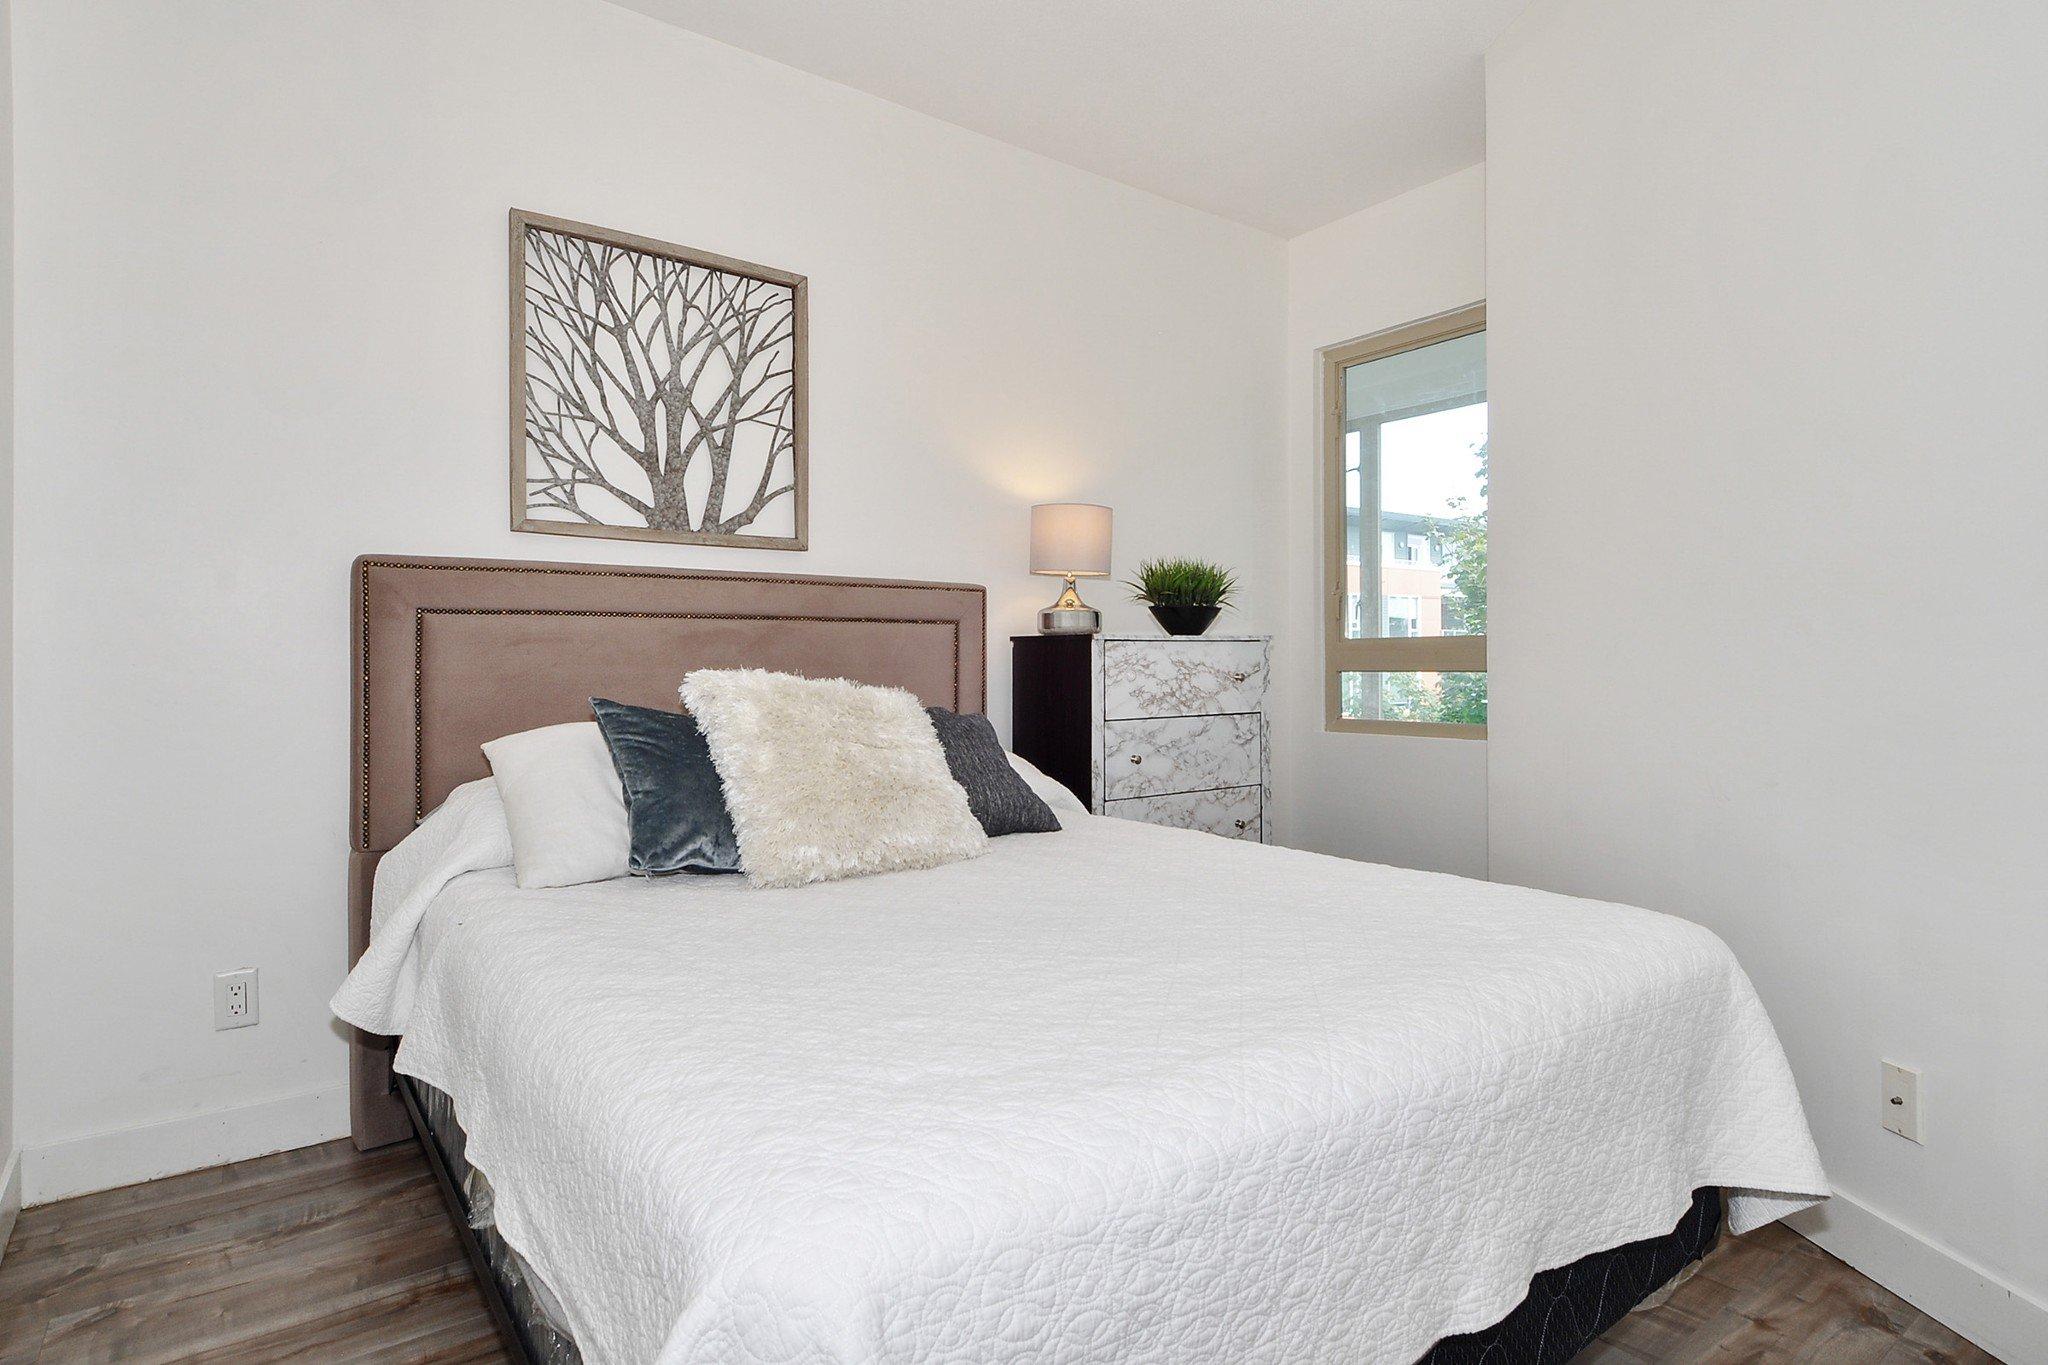 "Photo 10: Photos: 302 688 E 17TH Avenue in Vancouver: Fraser VE Condo for sale in ""MONDELLA"" (Vancouver East)  : MLS®# R2403902"